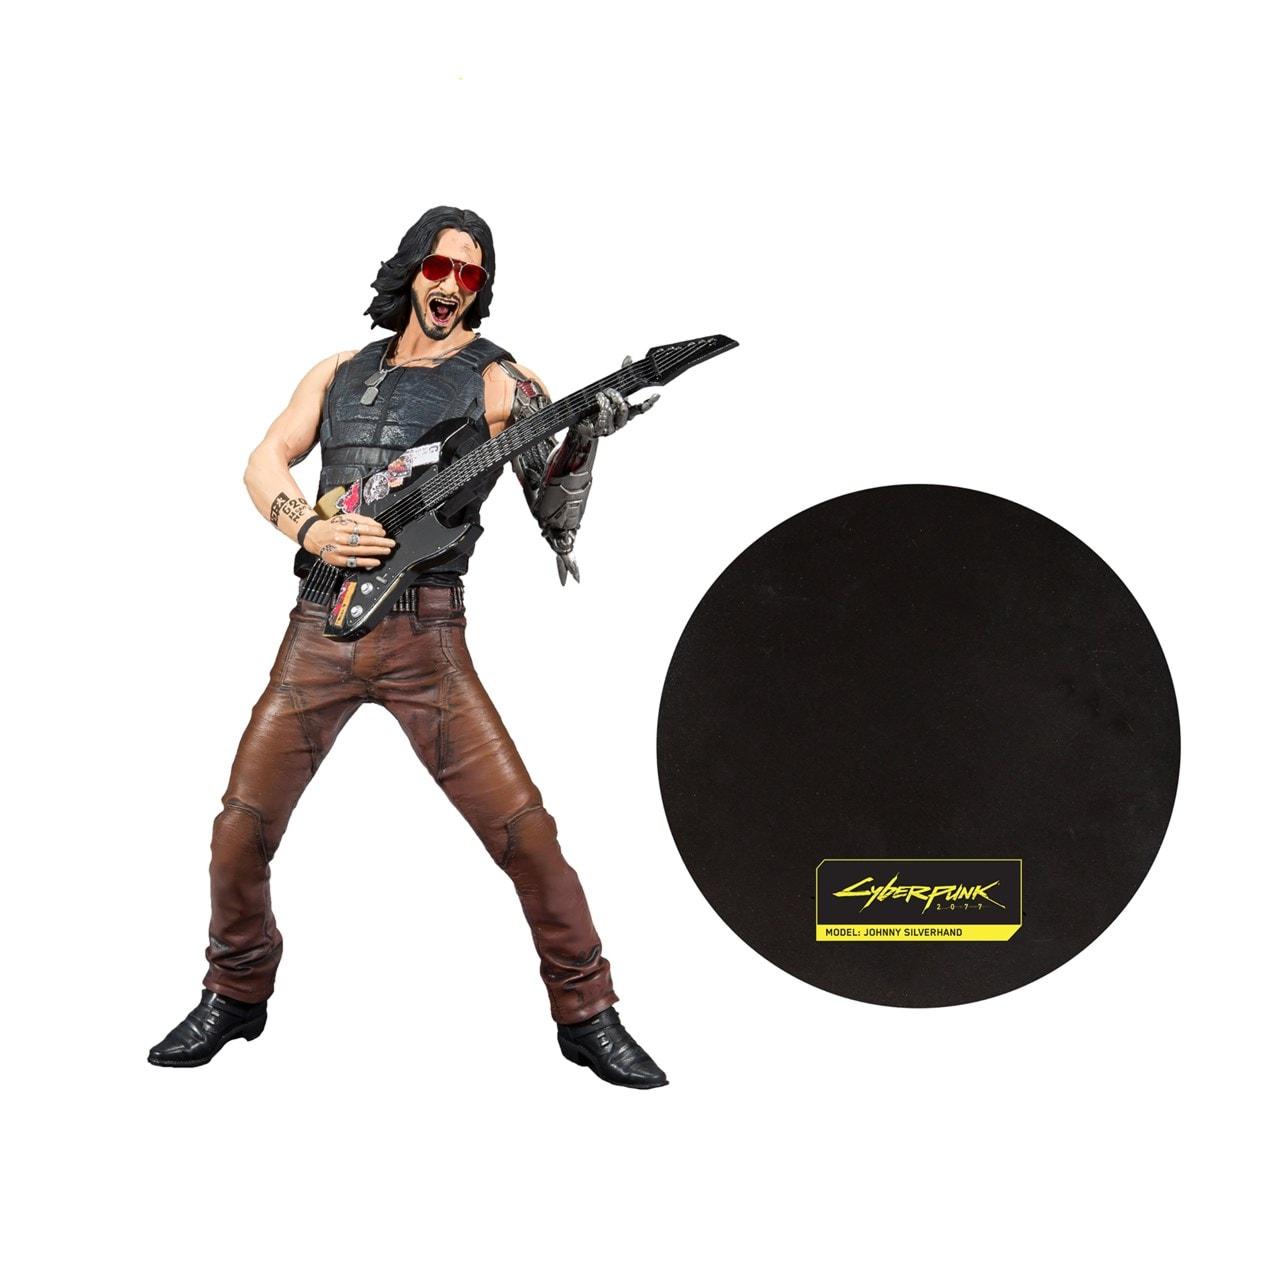 Cyberpunk 2077: Johnny Silverhand (Chrome Rock) Figurine - 3